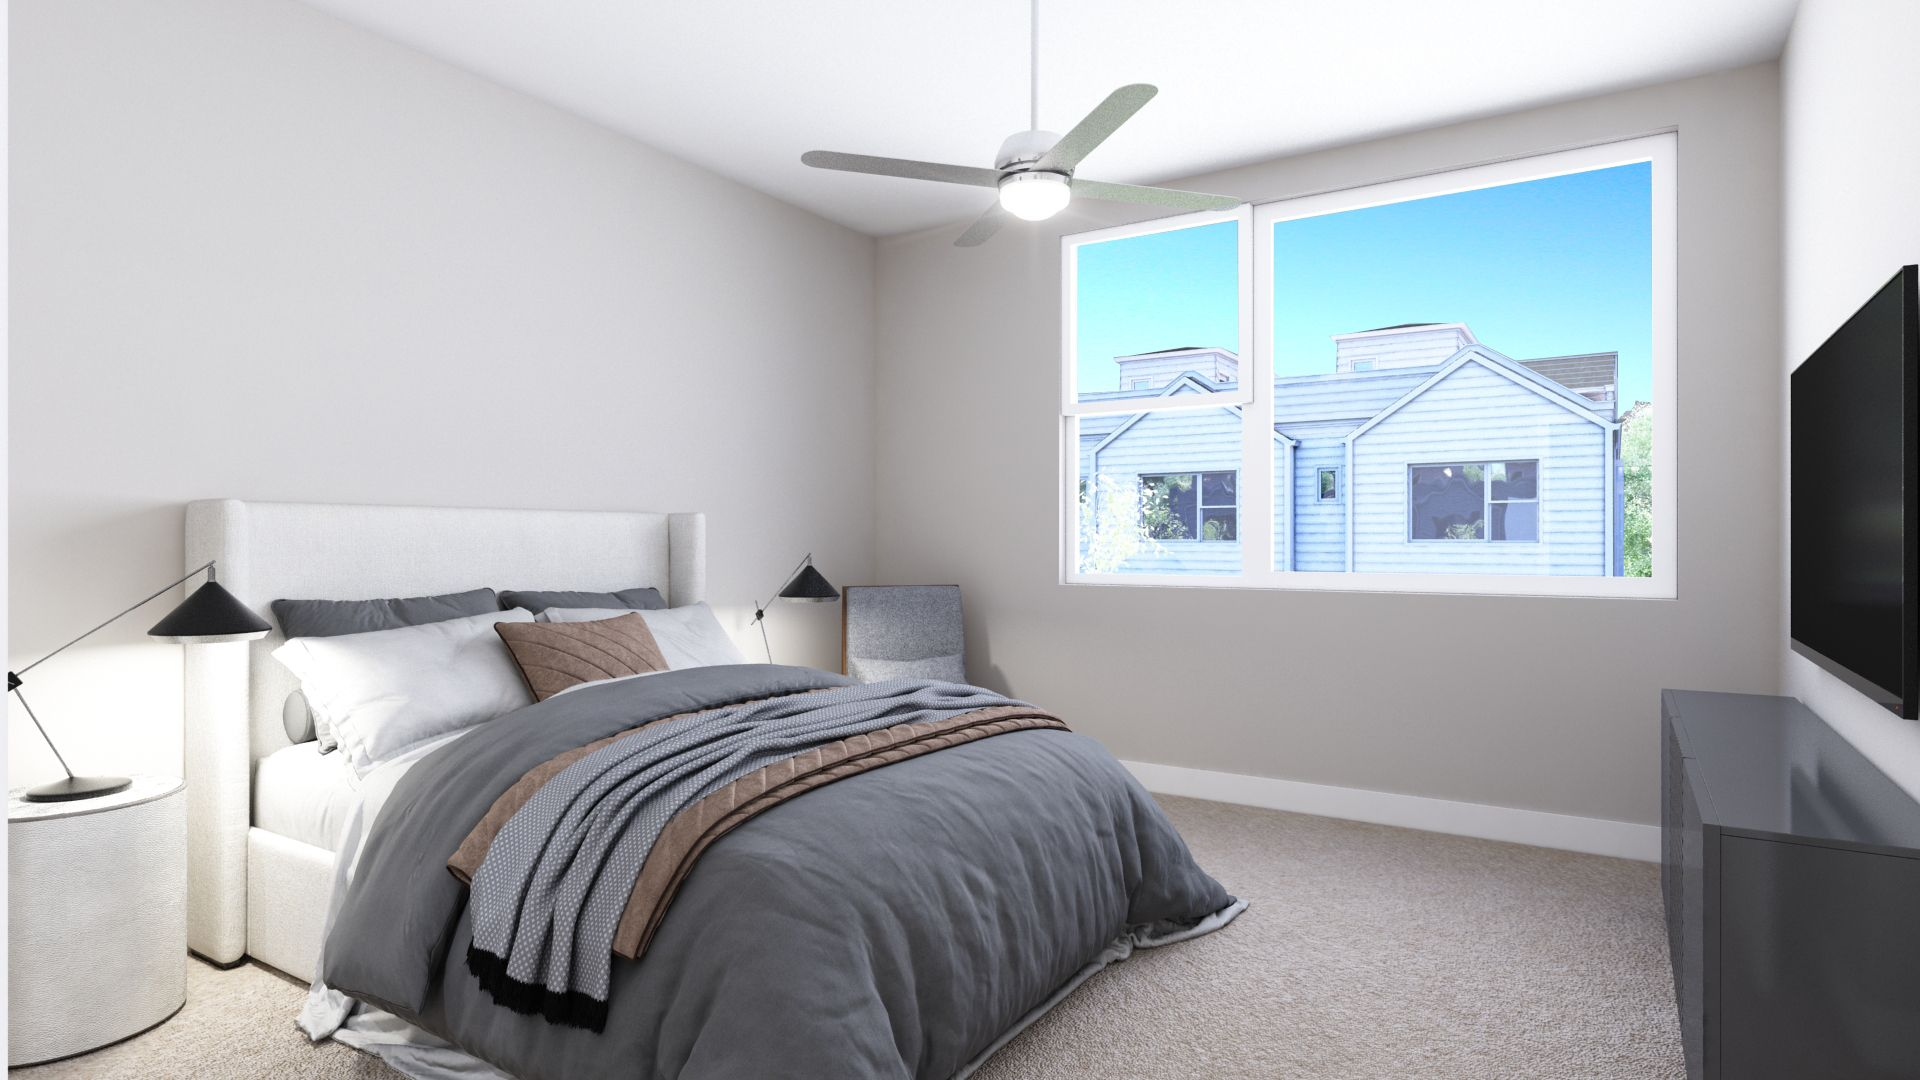 Bedroom featured in the B Plan By Koelbel Urban Homes in Denver, CO